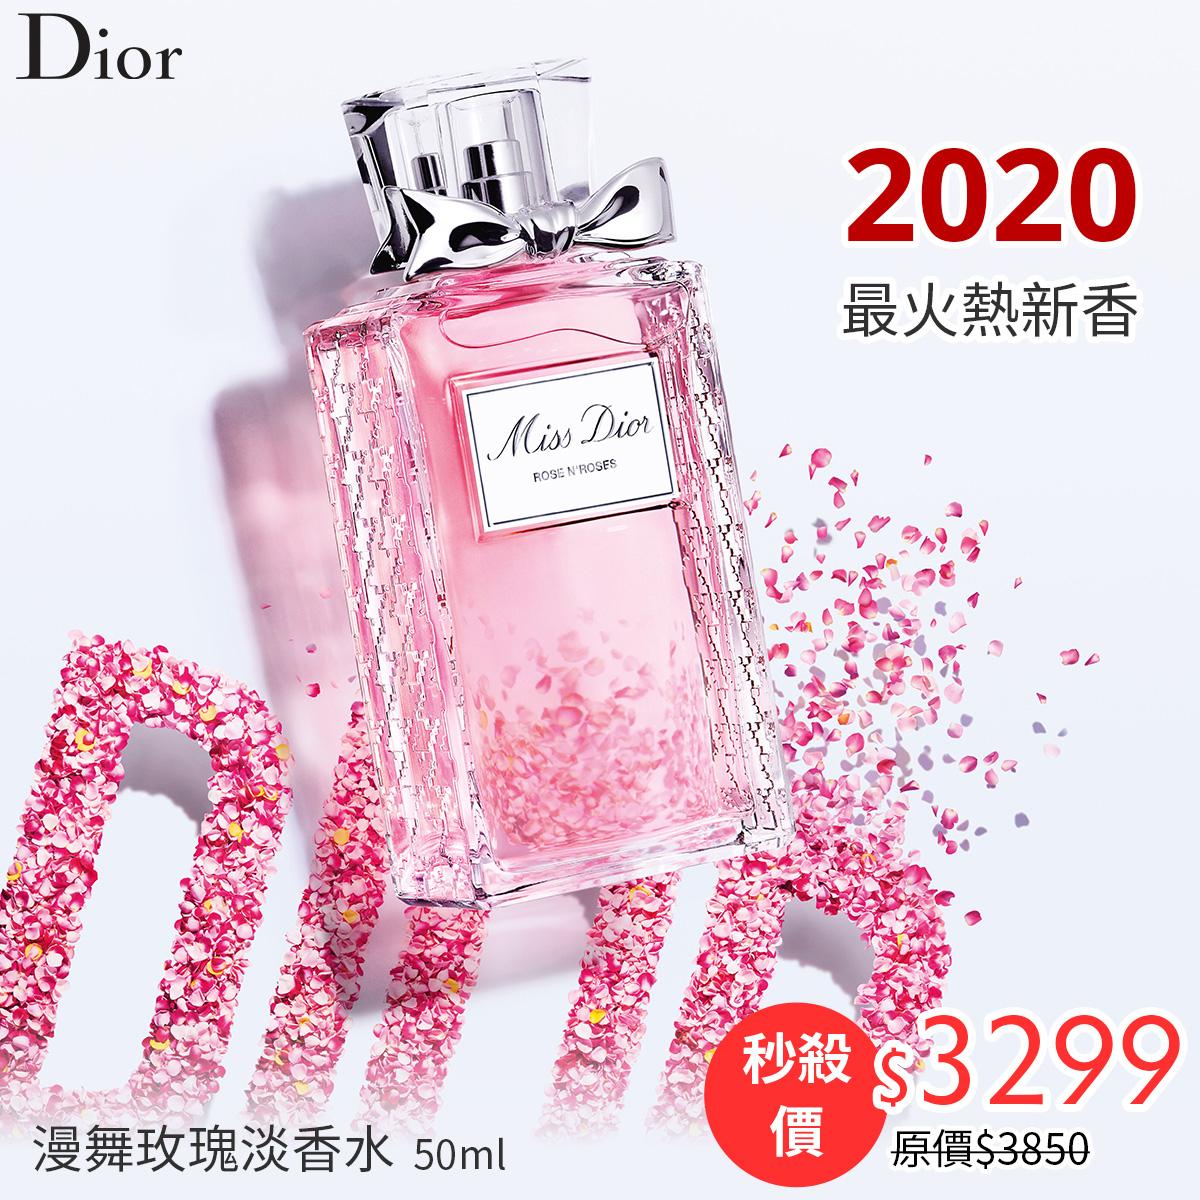 Dior 漫舞玫瑰